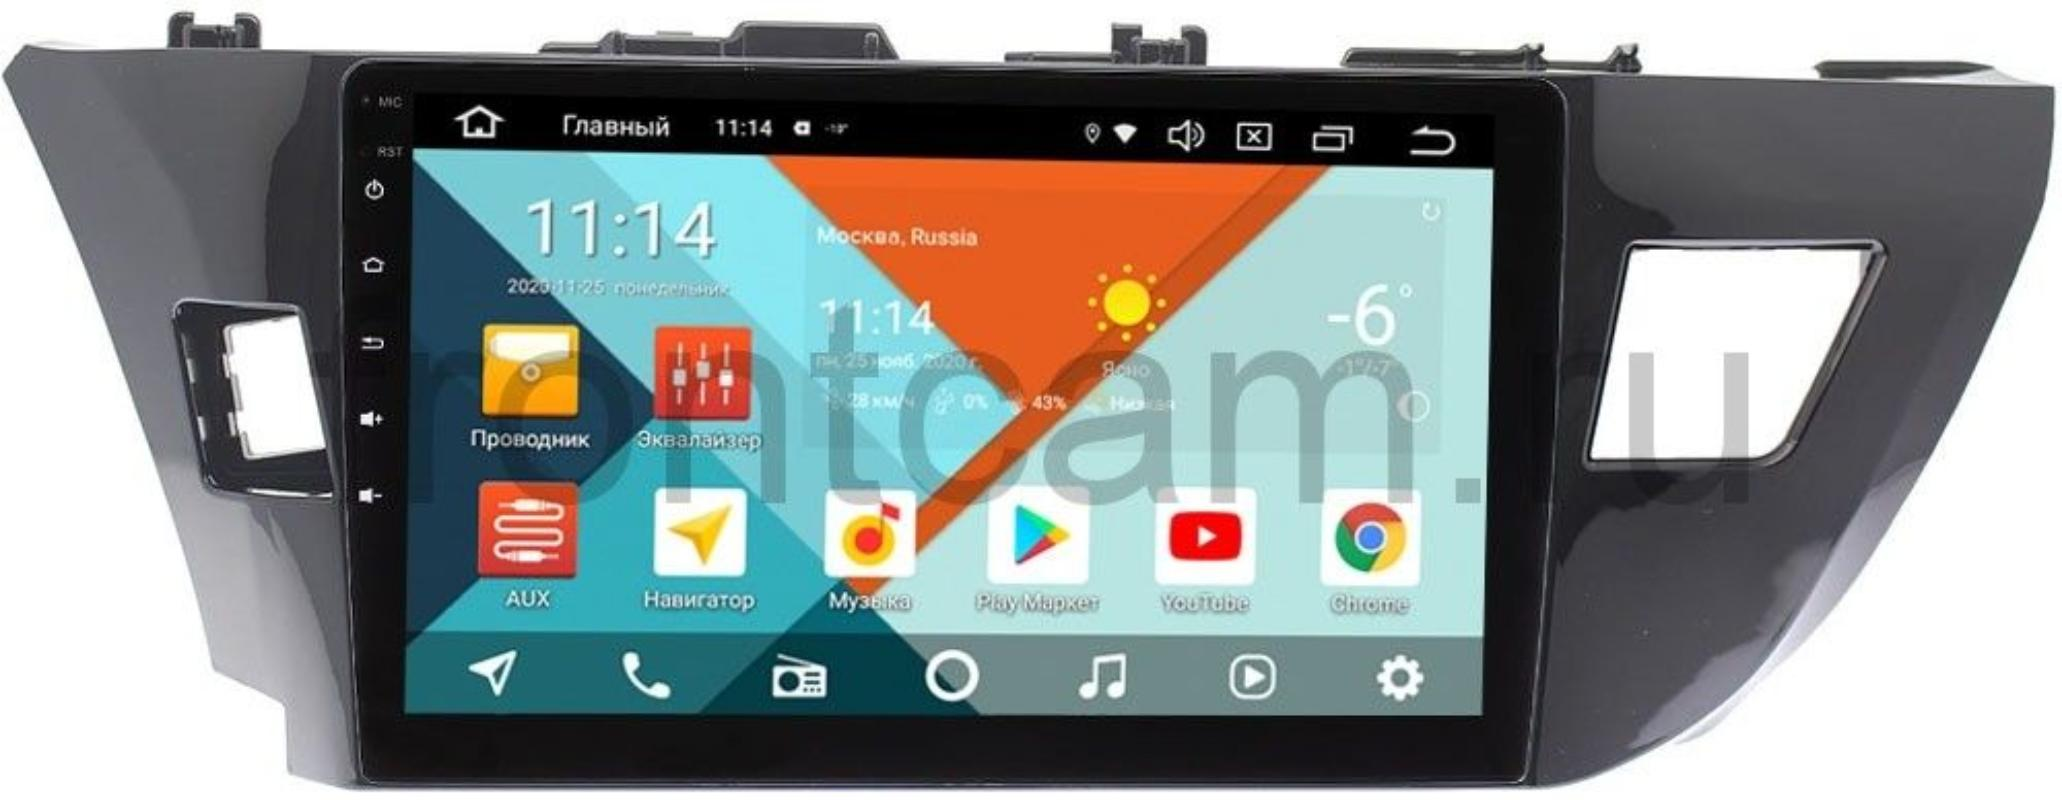 Штатная магнитола Toyota Corolla XI 2013-2015 Wide Media KS1005QM-2/32 DSP CarPlay 4G-SIM на Android 10 (для авто без камеры) (+ Камера заднего вида в подарок!)